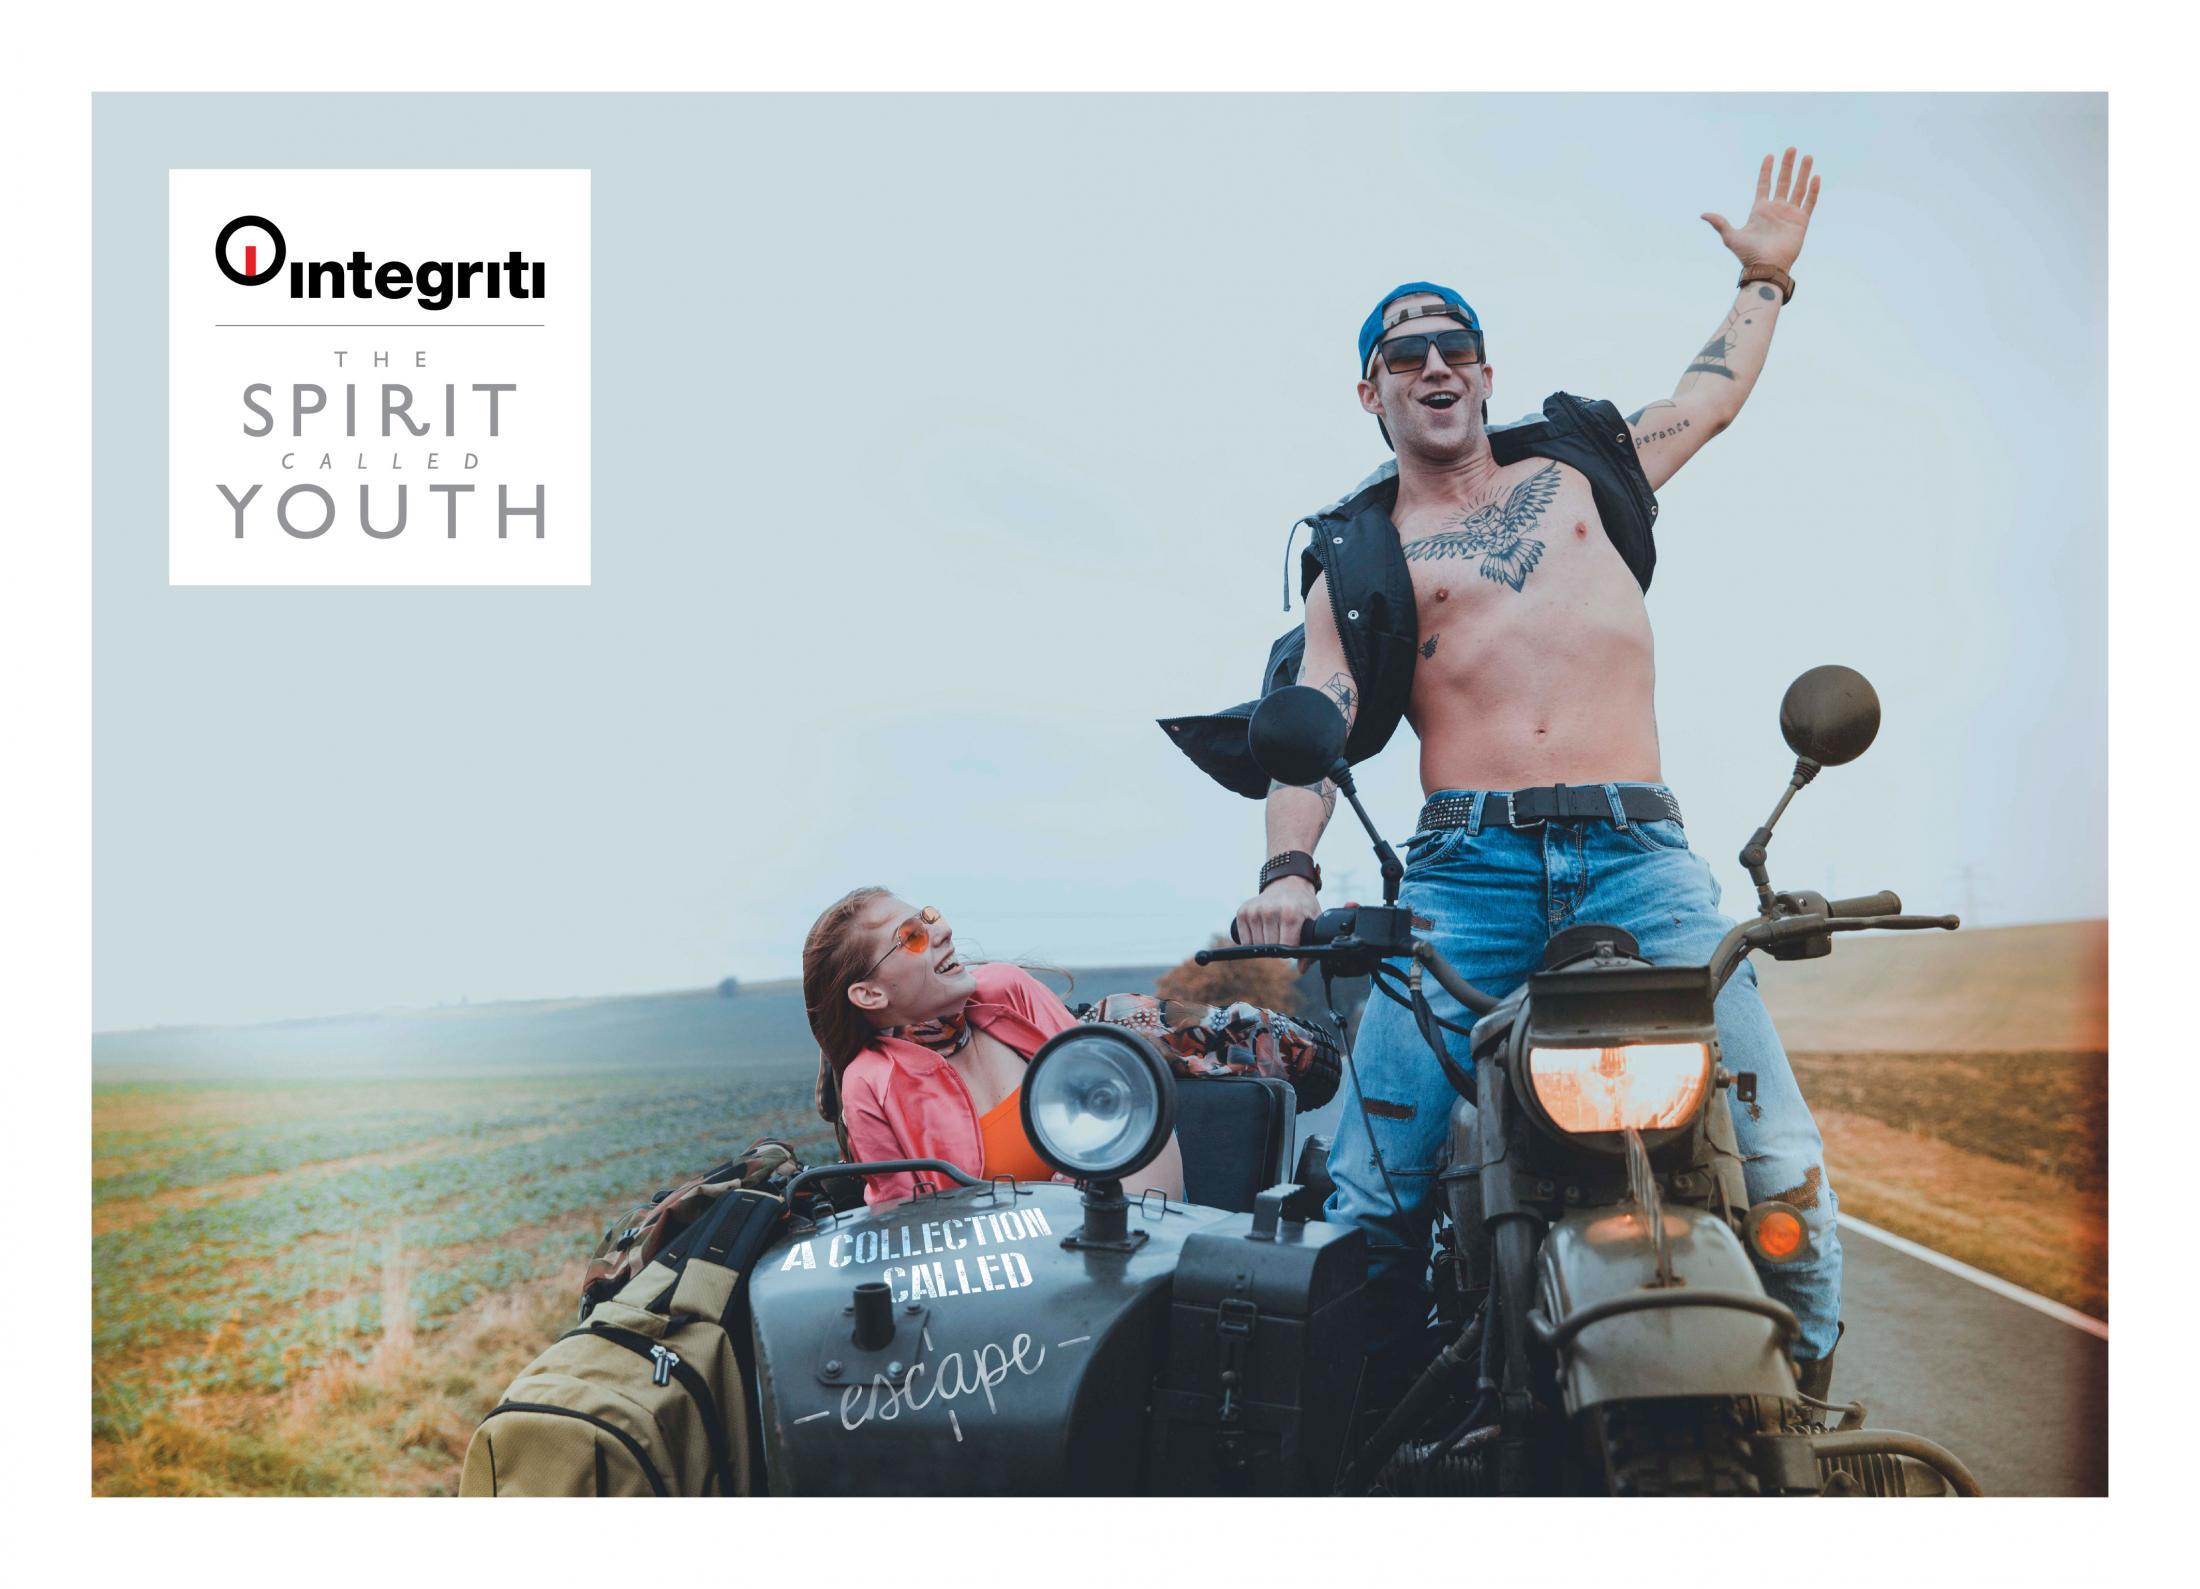 Integriti Print Ad - The spirit called youth, 7